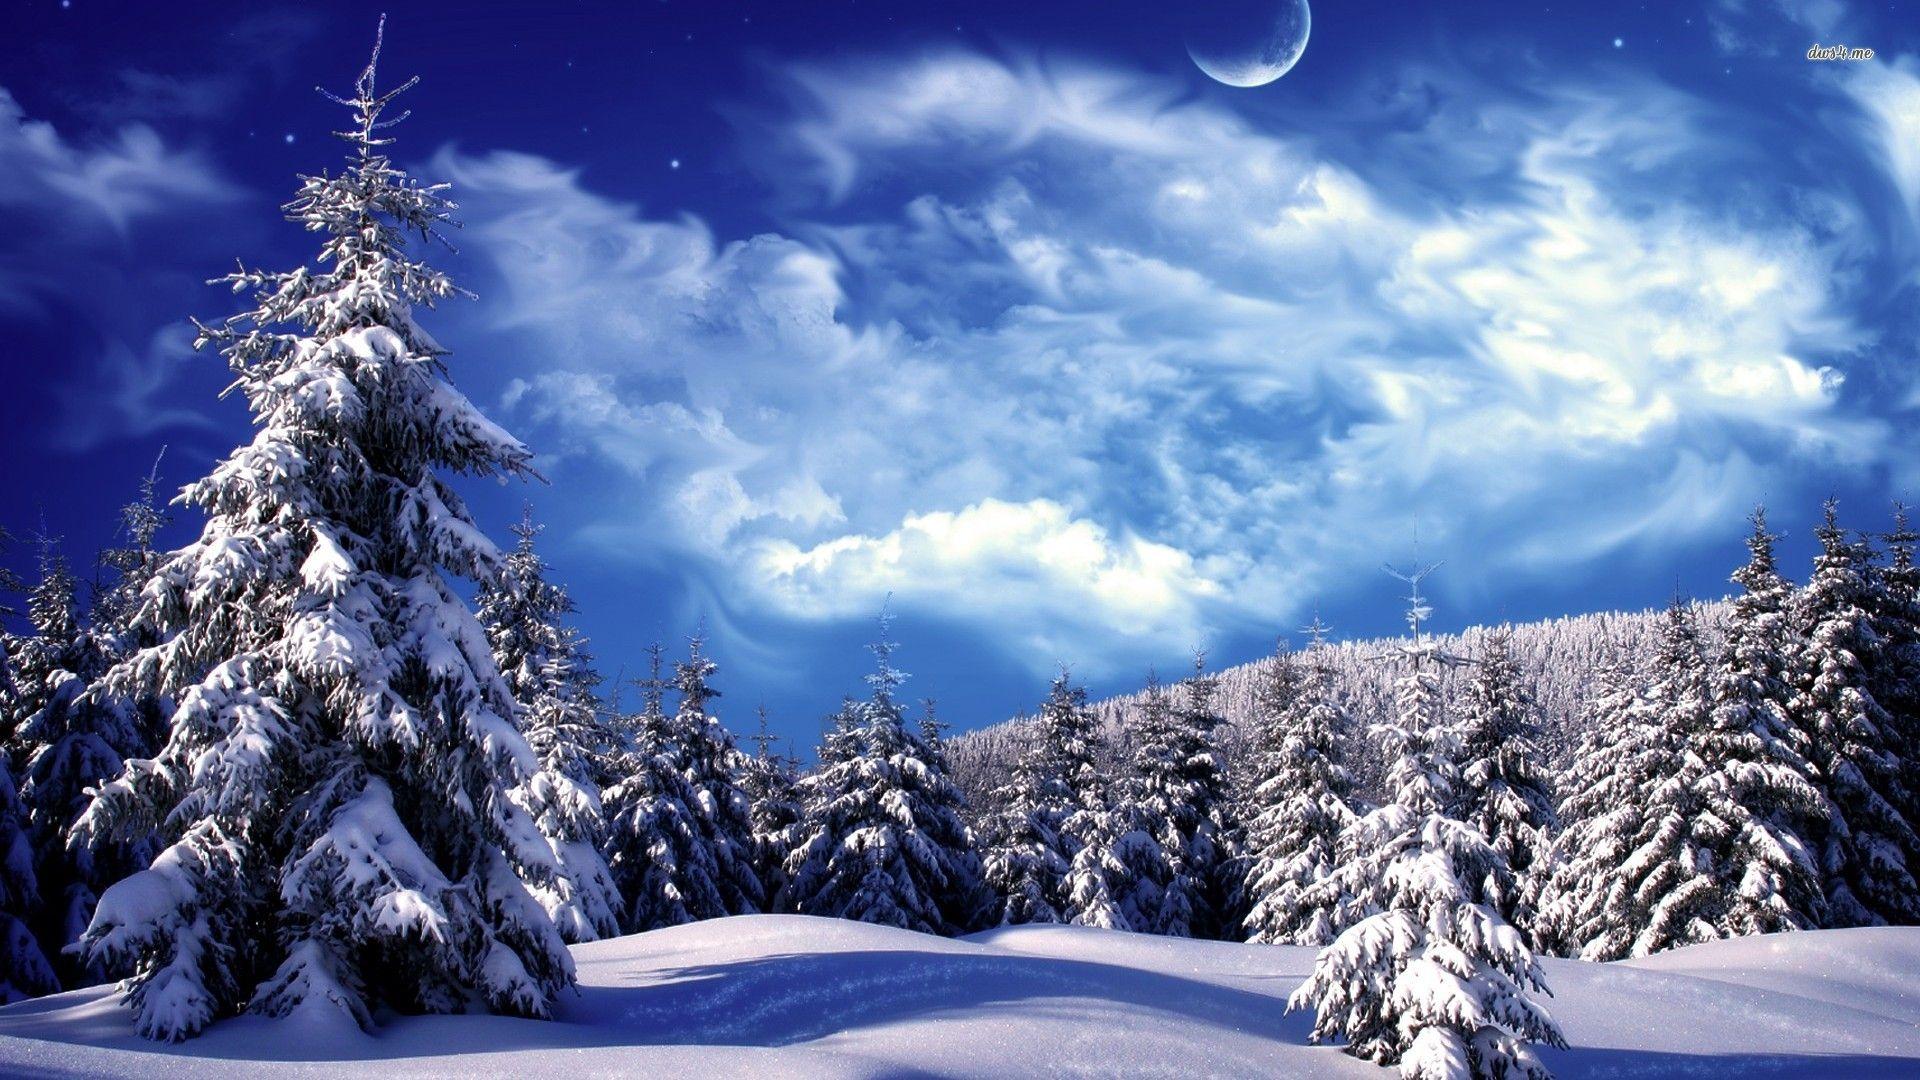 Winter Wonderland Wallpaper, Winter Wonderland Pictures, - Winter Wonderland Background Hd , HD Wallpaper & Backgrounds